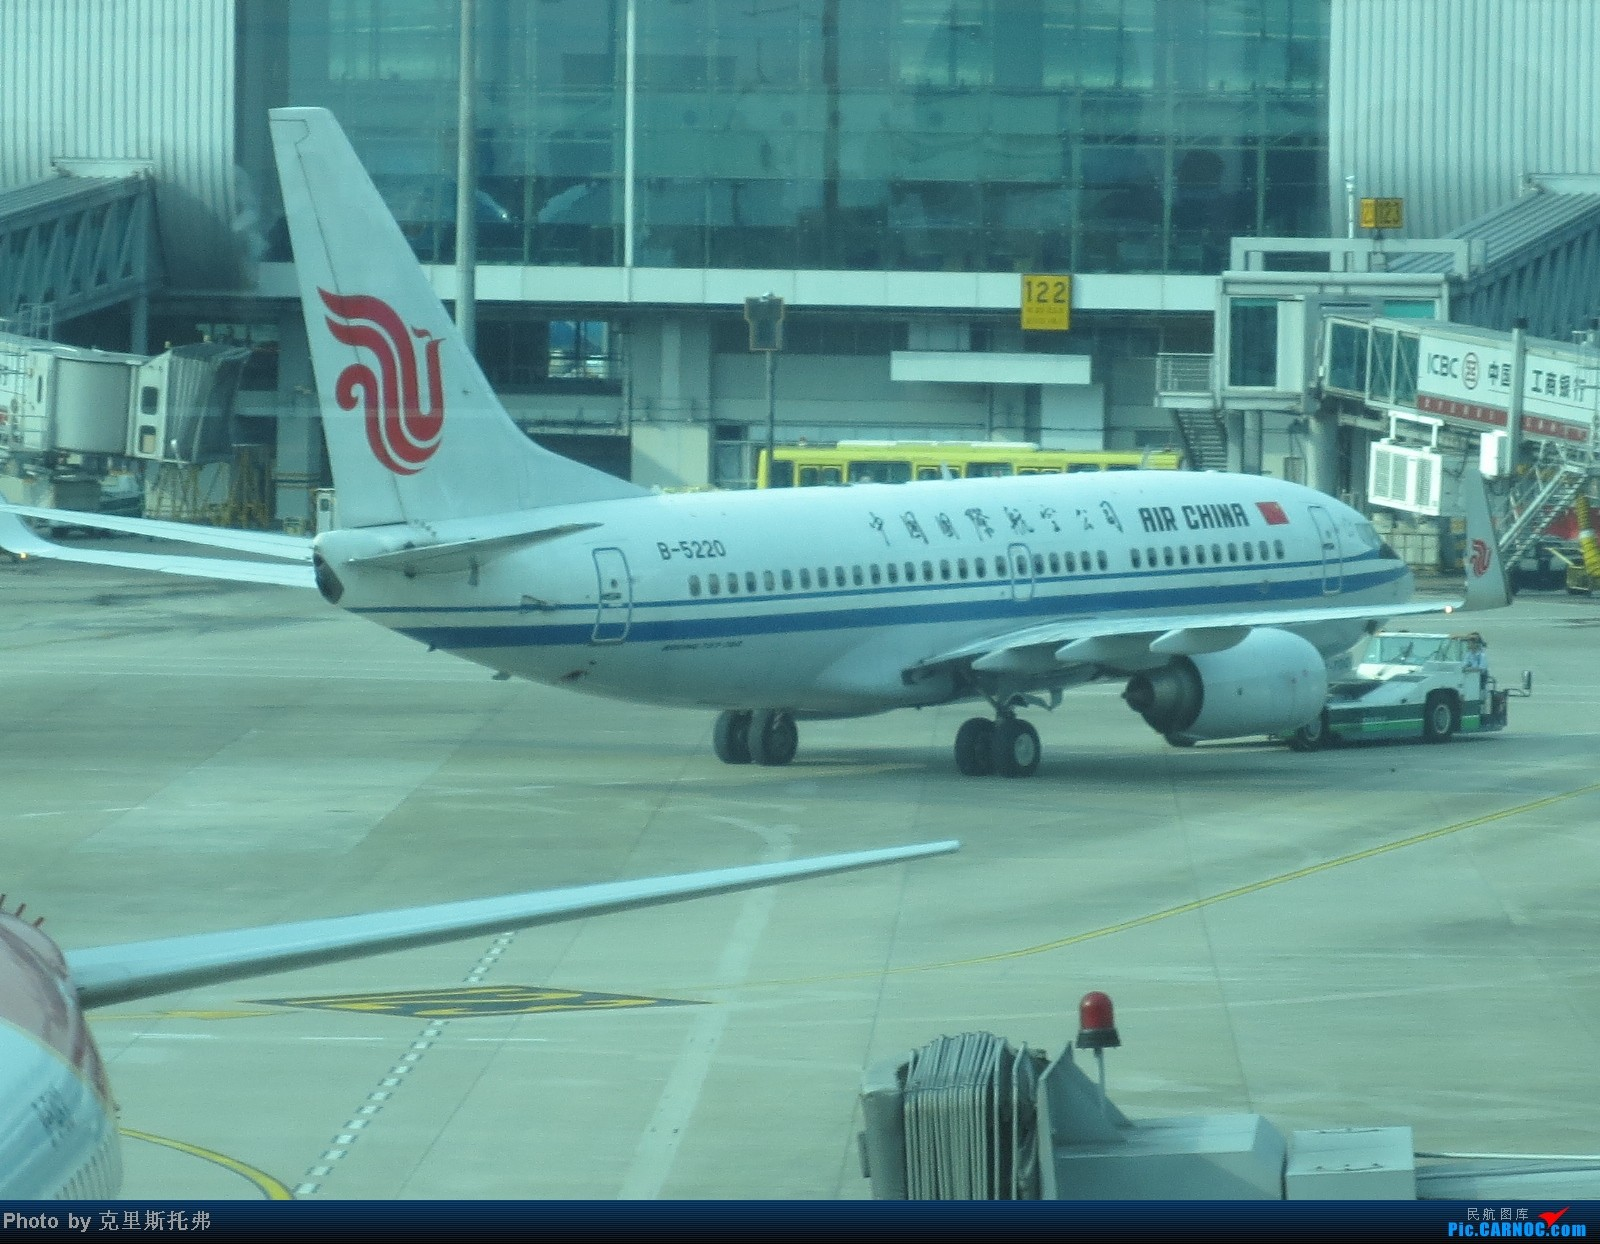 Re:[原创]【广州,你好!】八月齐鲁行 第一集 {初到齐鲁城} 不期而遇,鹏程行万里 相伴相惜,享飞行至美 BOEING 737-700 B-5220